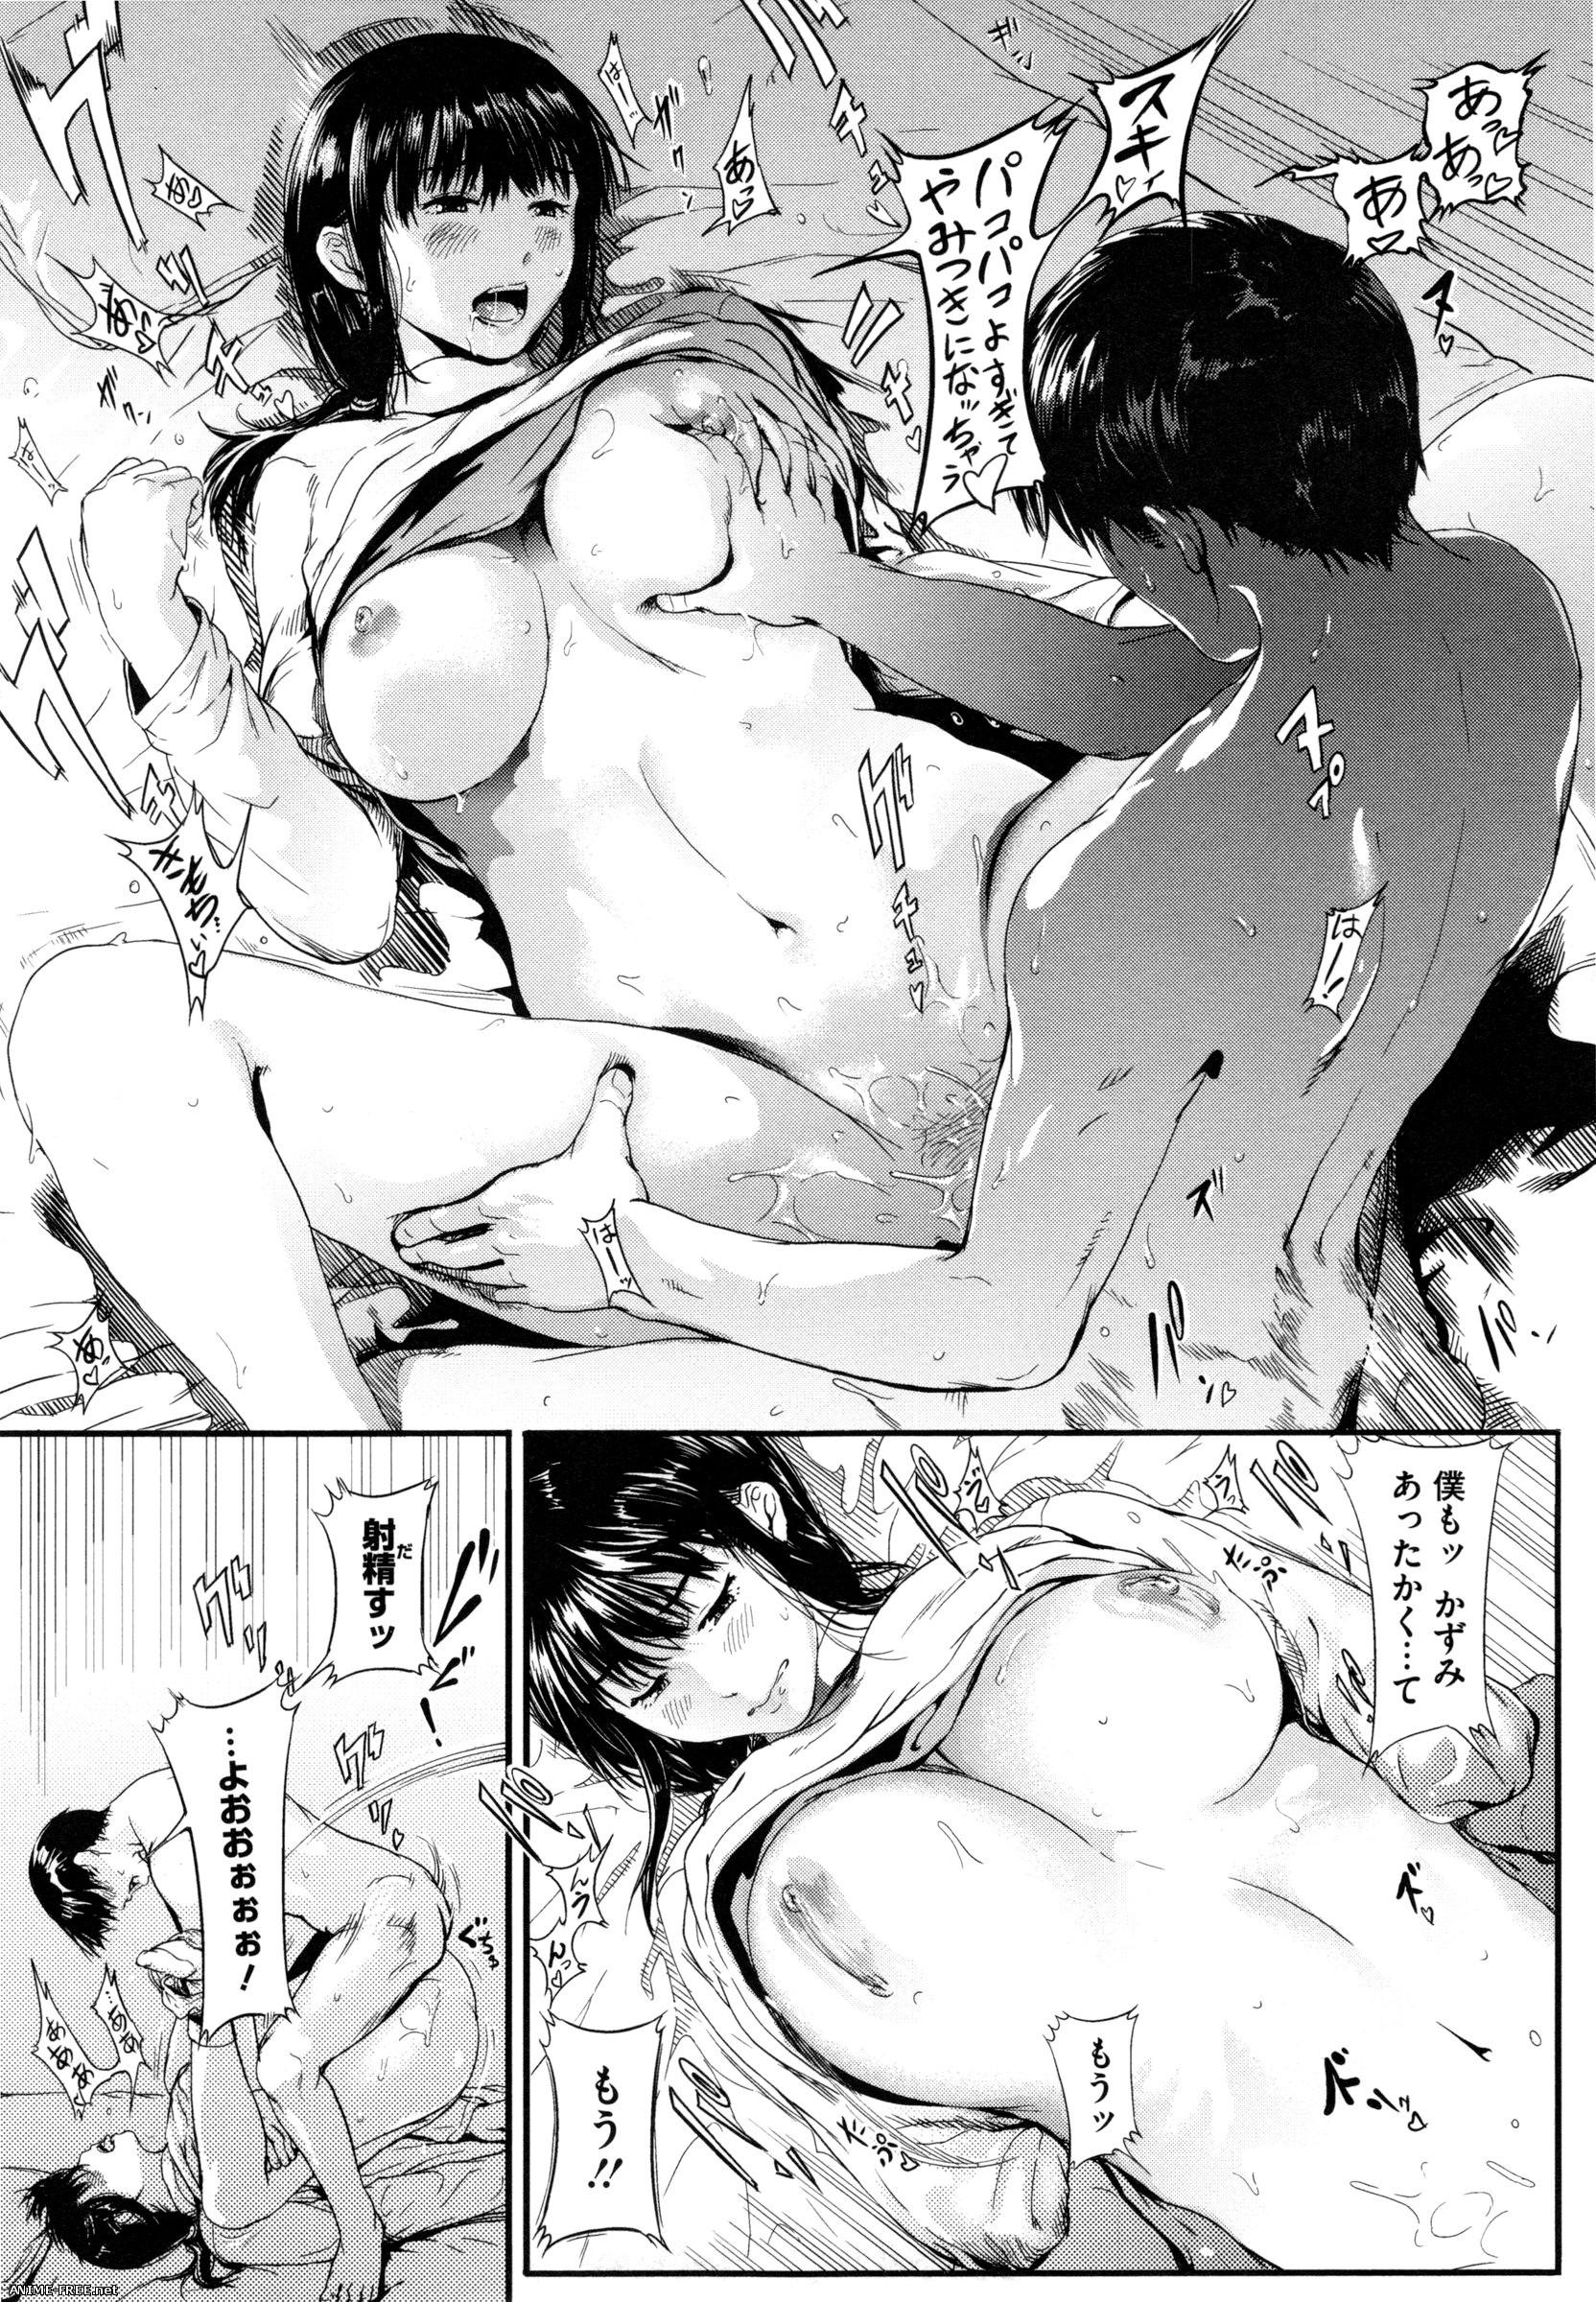 Kurofood / Kuro Food (Collection) - Сборник хентай манги [Ptcen] [RUS,JAP] Manga Hentai